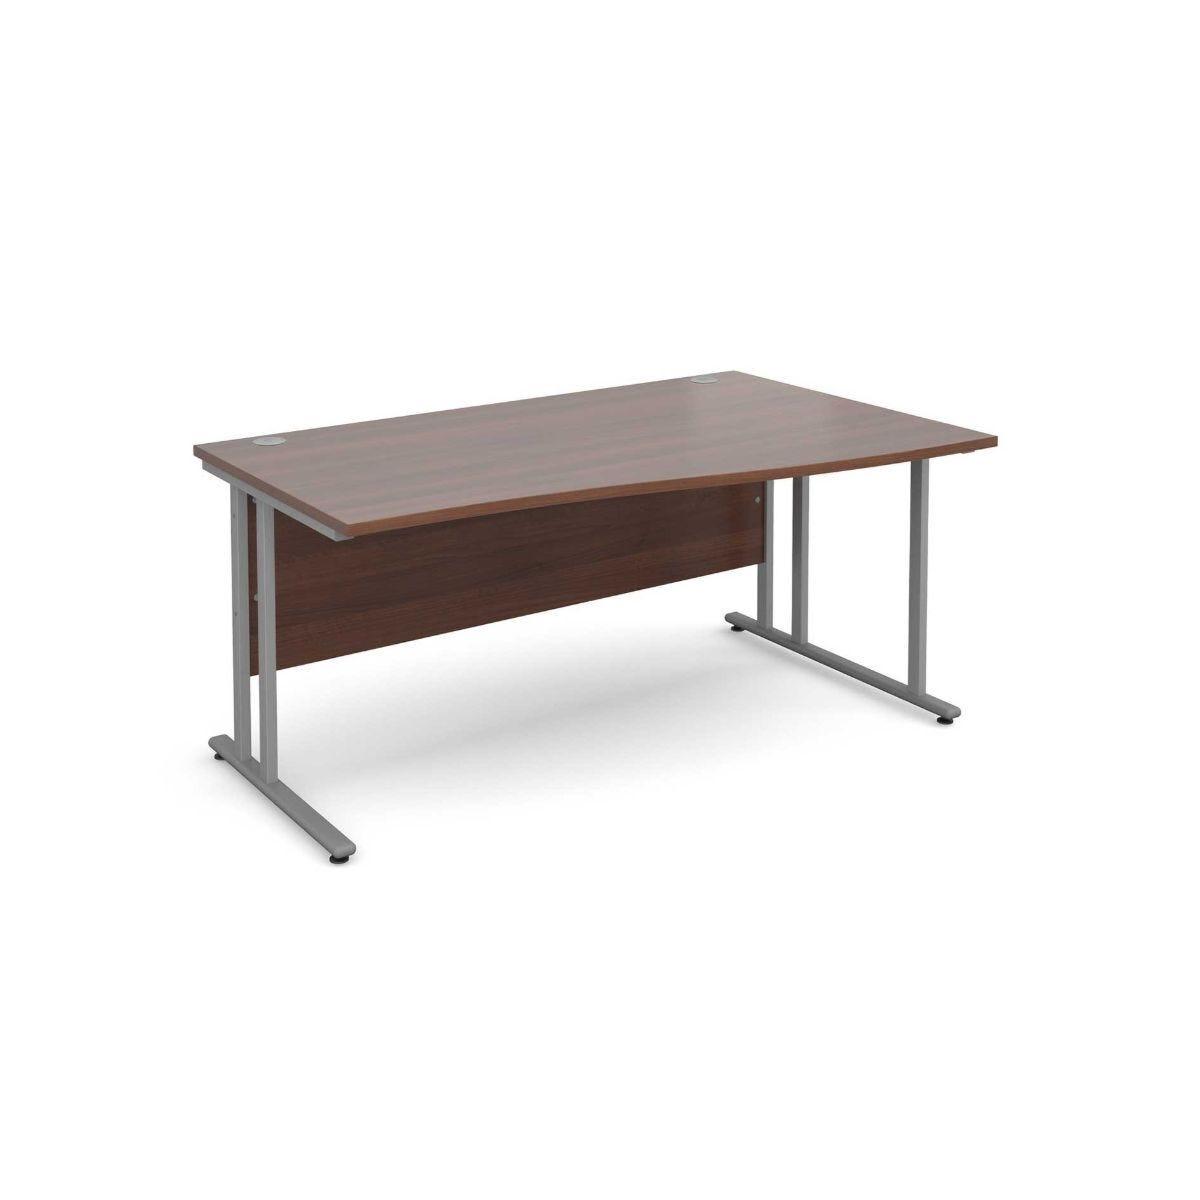 Maestro 25 Right Hand Wave 1600 Desk with Silver Legs Walnut